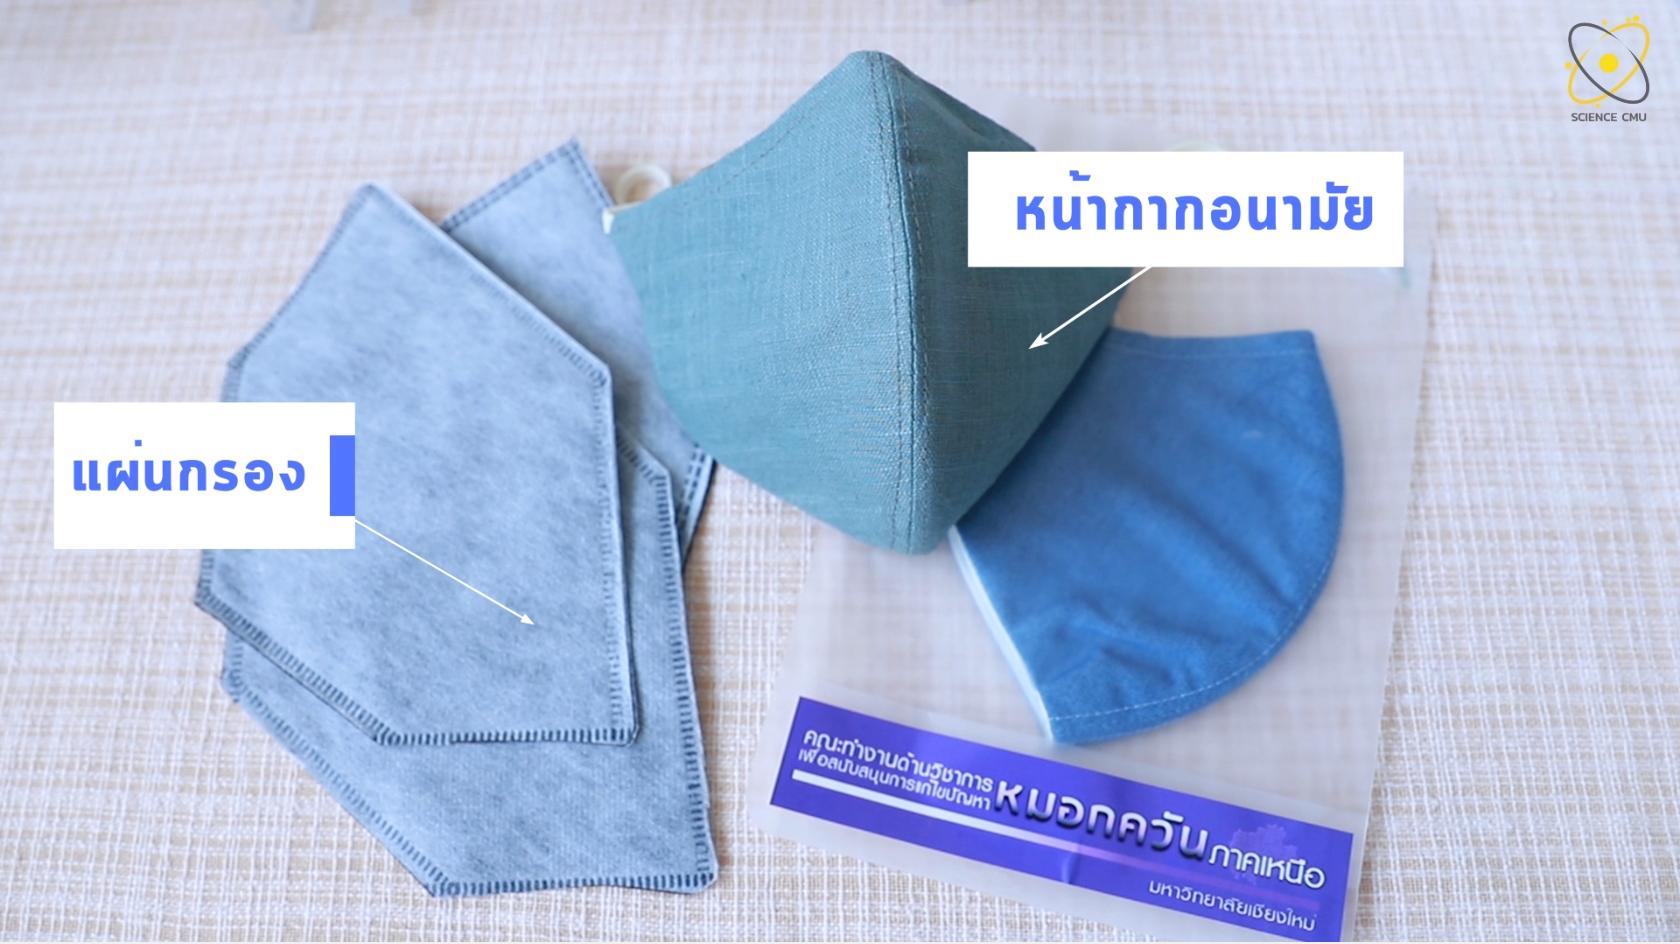 Workshop DIY ทำหน้ากากป้องกัน PM2.5 Reuse ได้ พร้อมจำหน่ายให้ผู้สนใจ